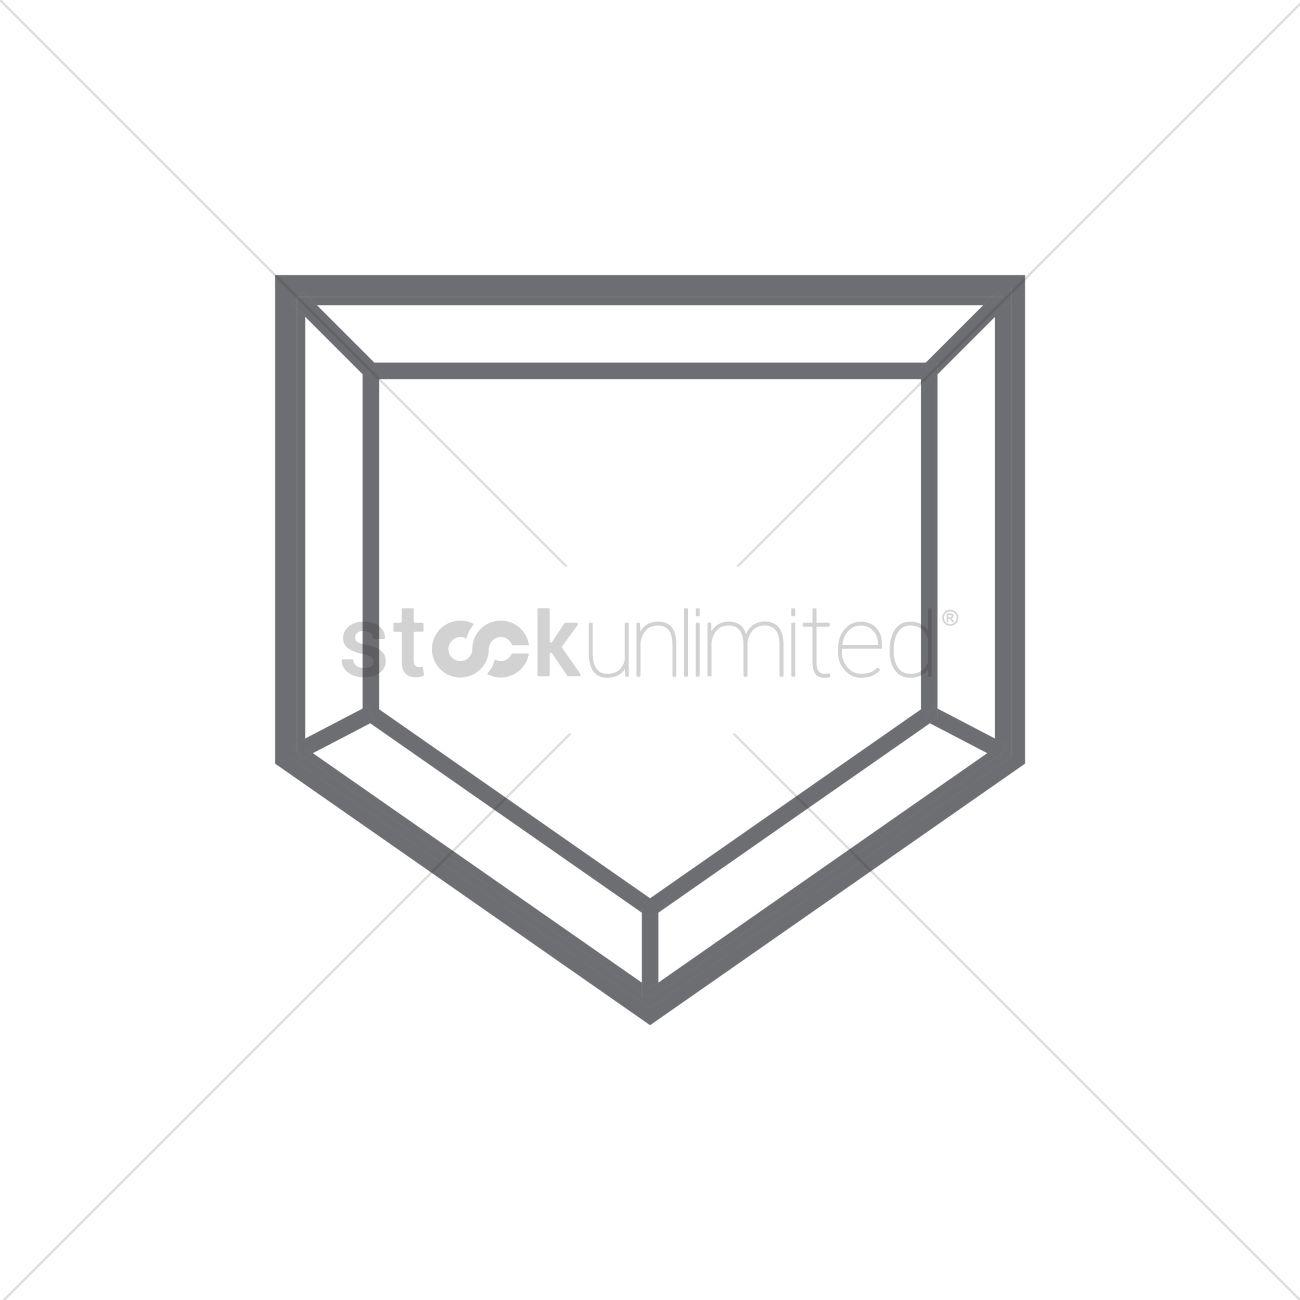 Baseball home plate Vector Image.